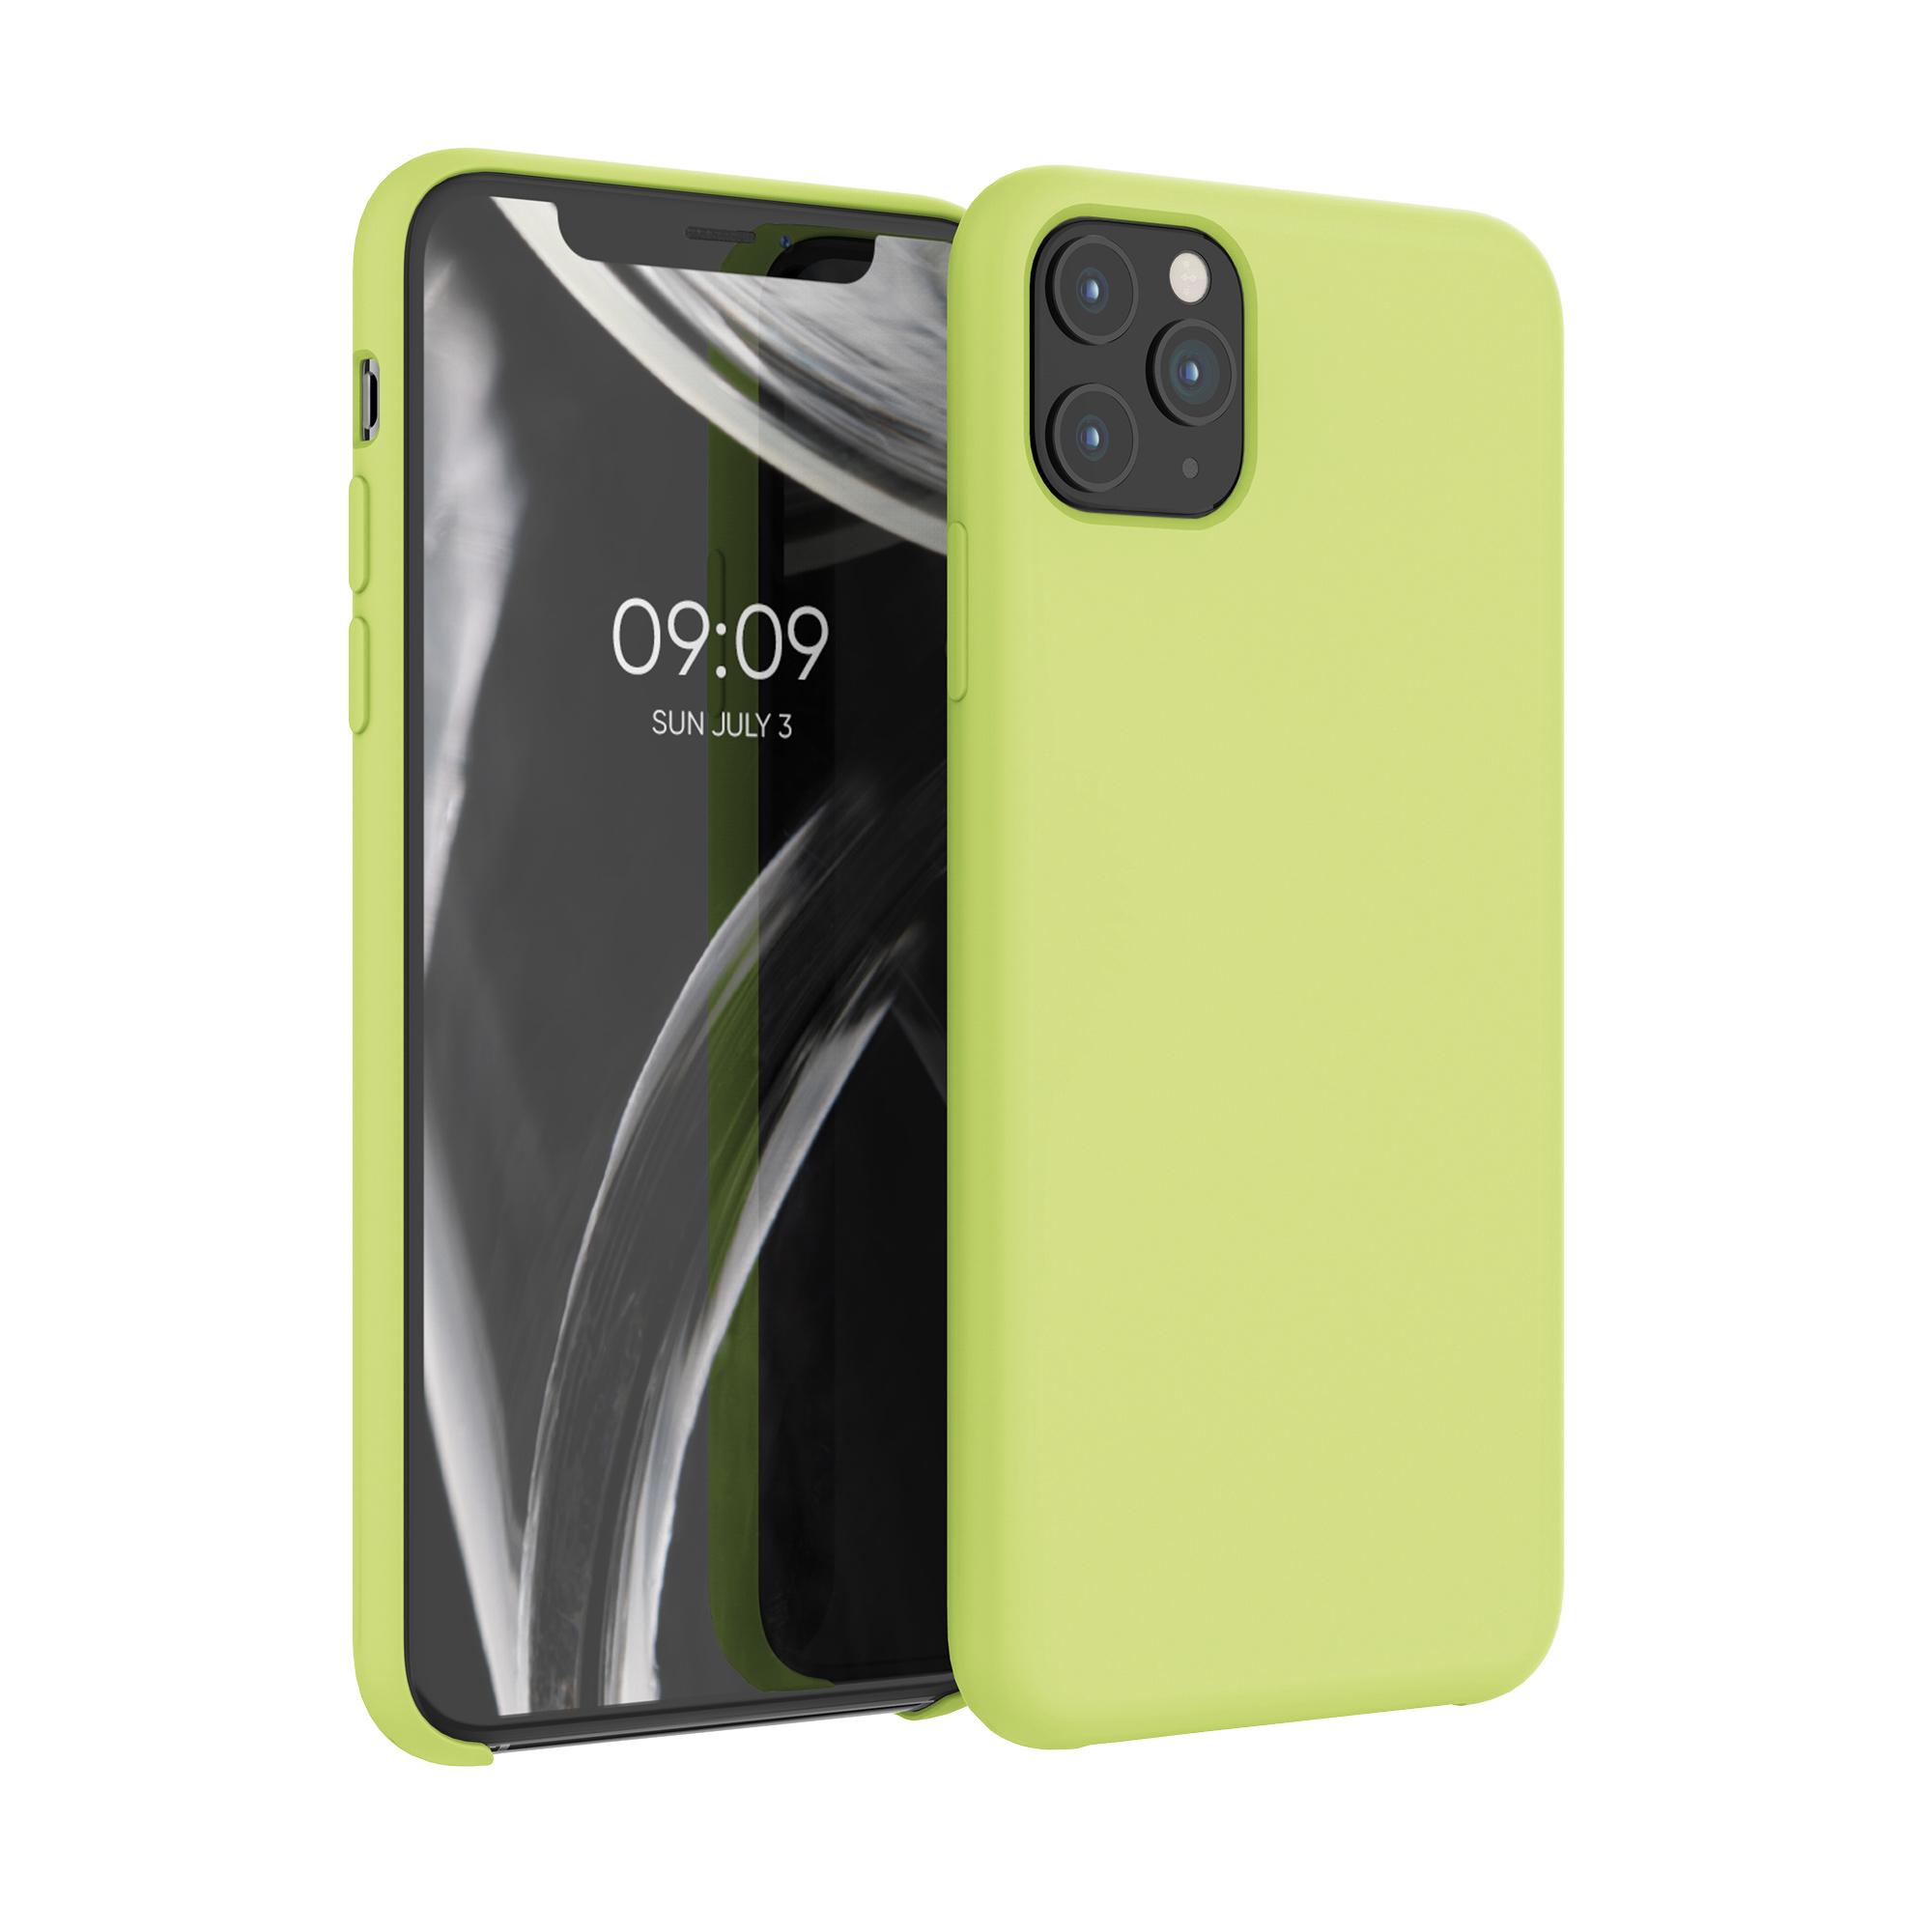 Kvalitní silikonové TPU pouzdro pro Apple iPhone 11 Pro Max - Matcha Green